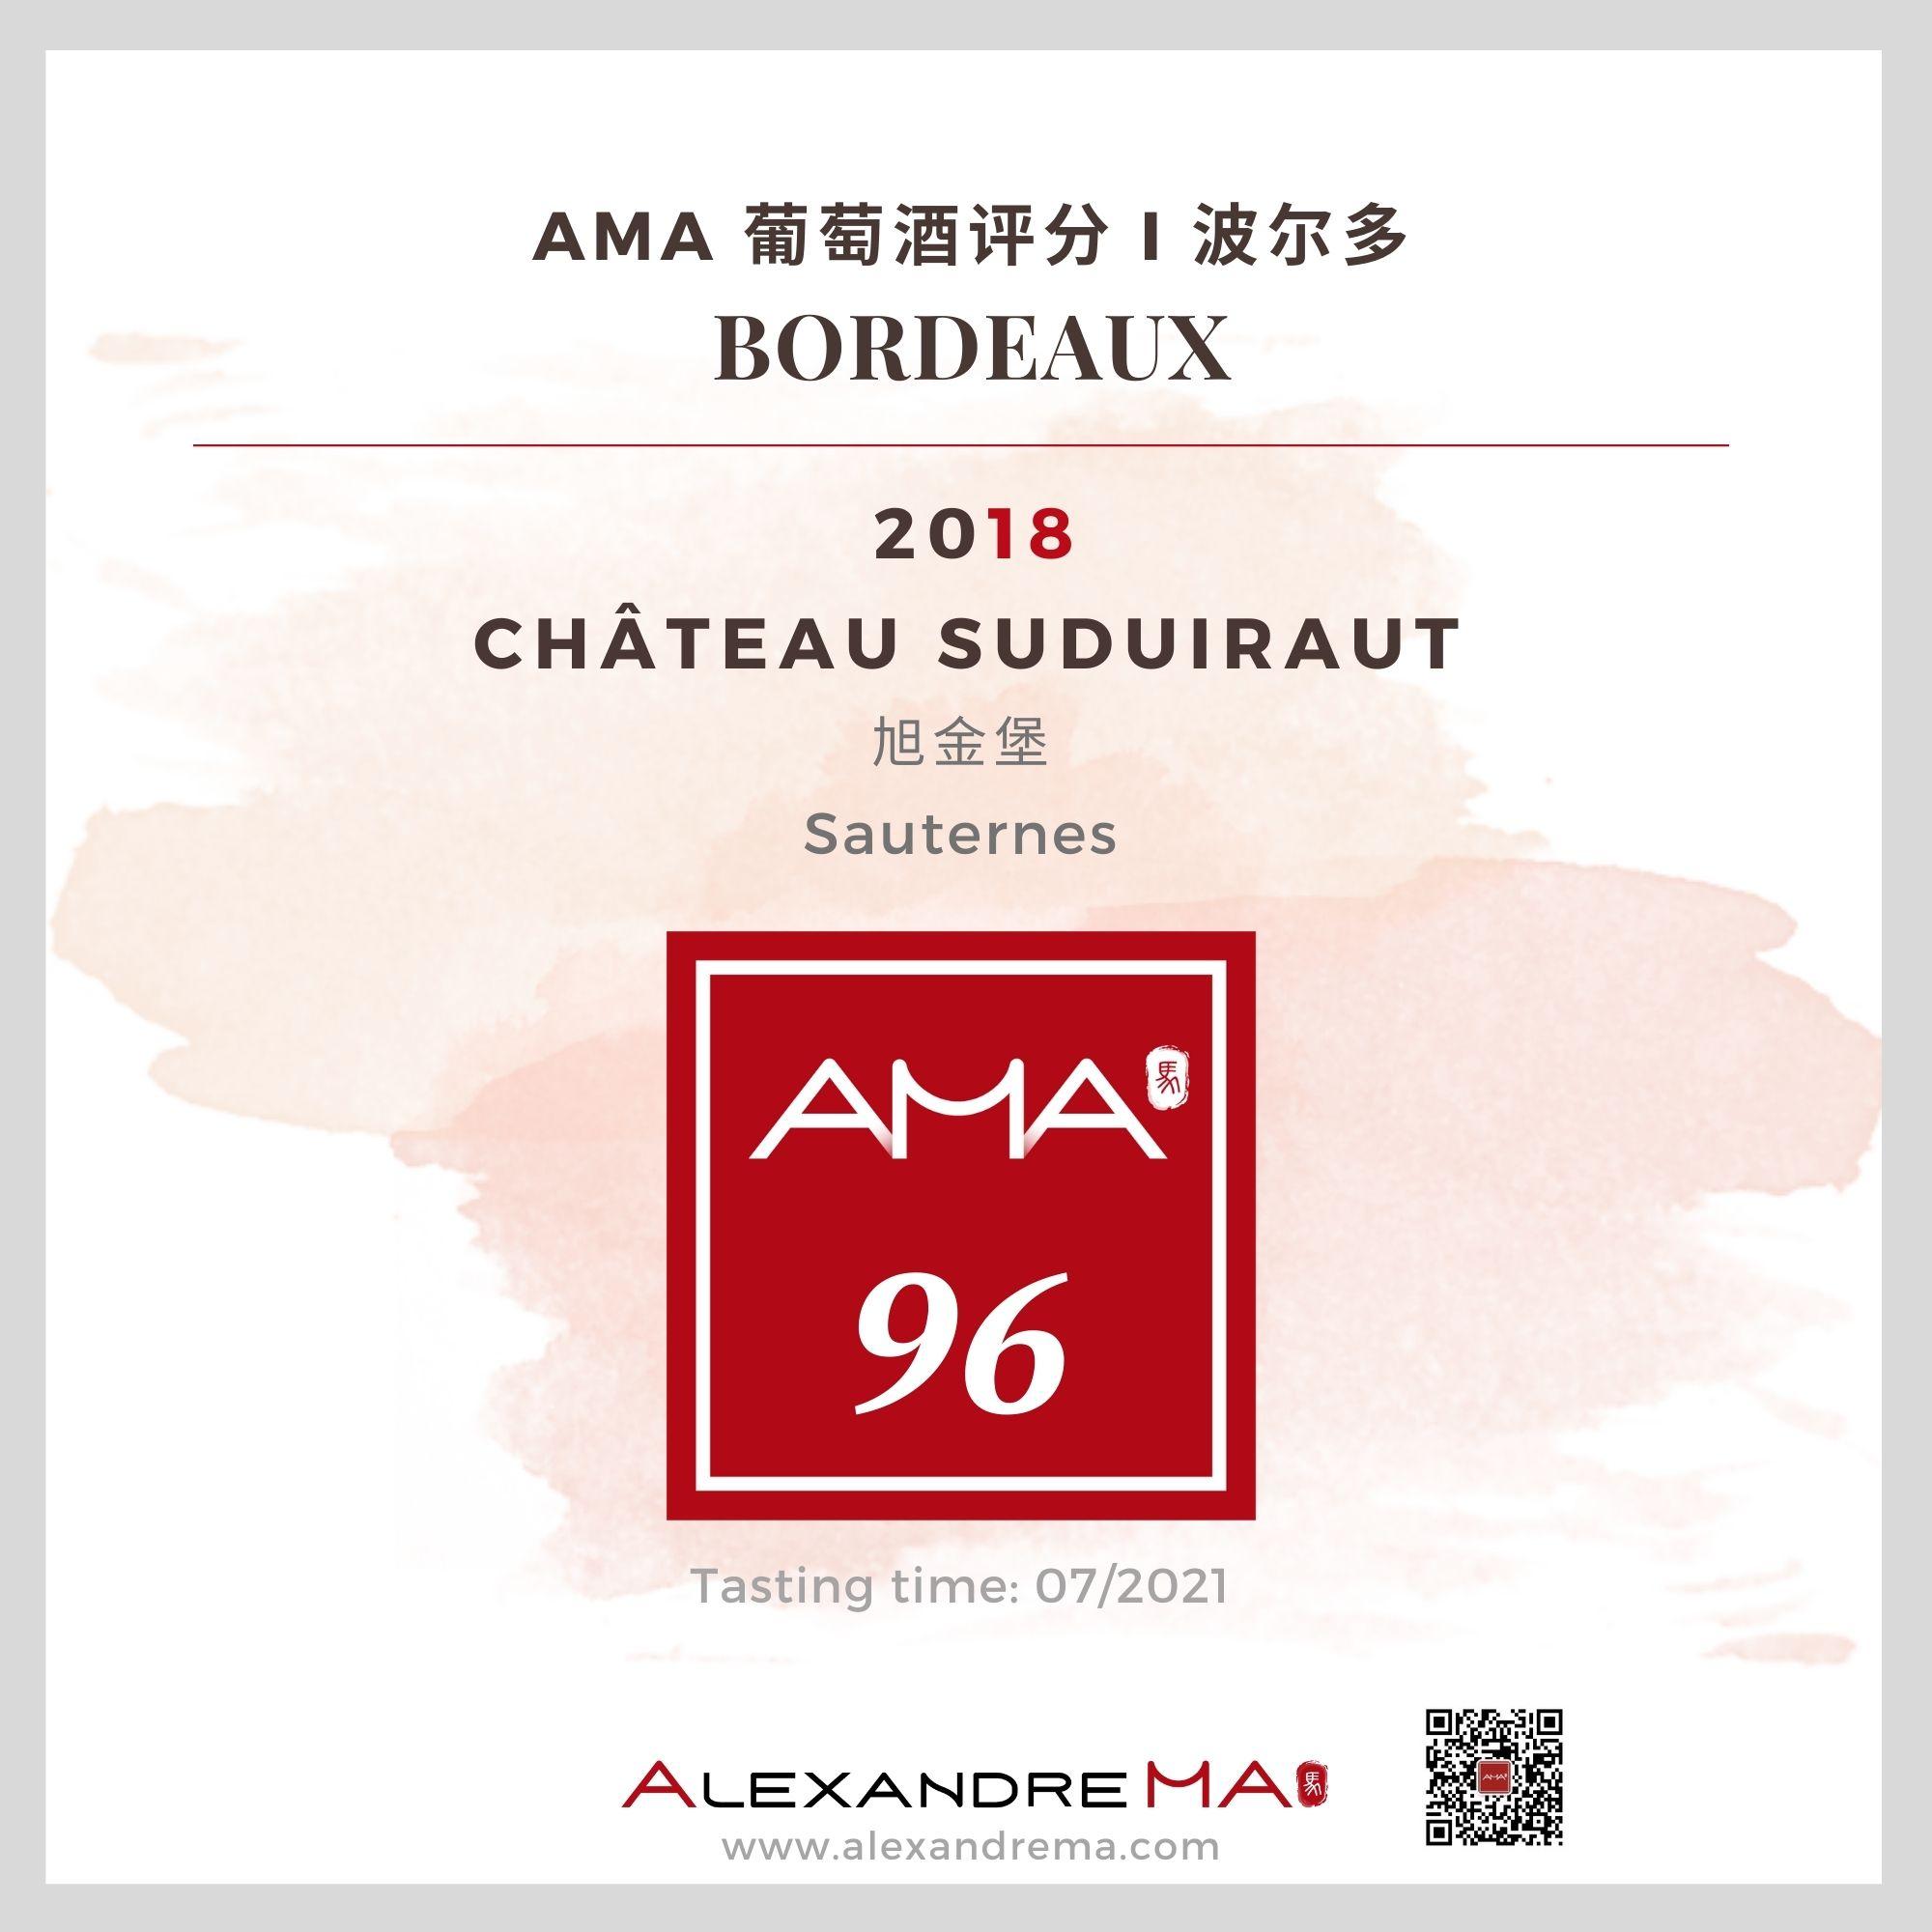 Château Suduiraut 2018 旭金堡 - Alexandre Ma